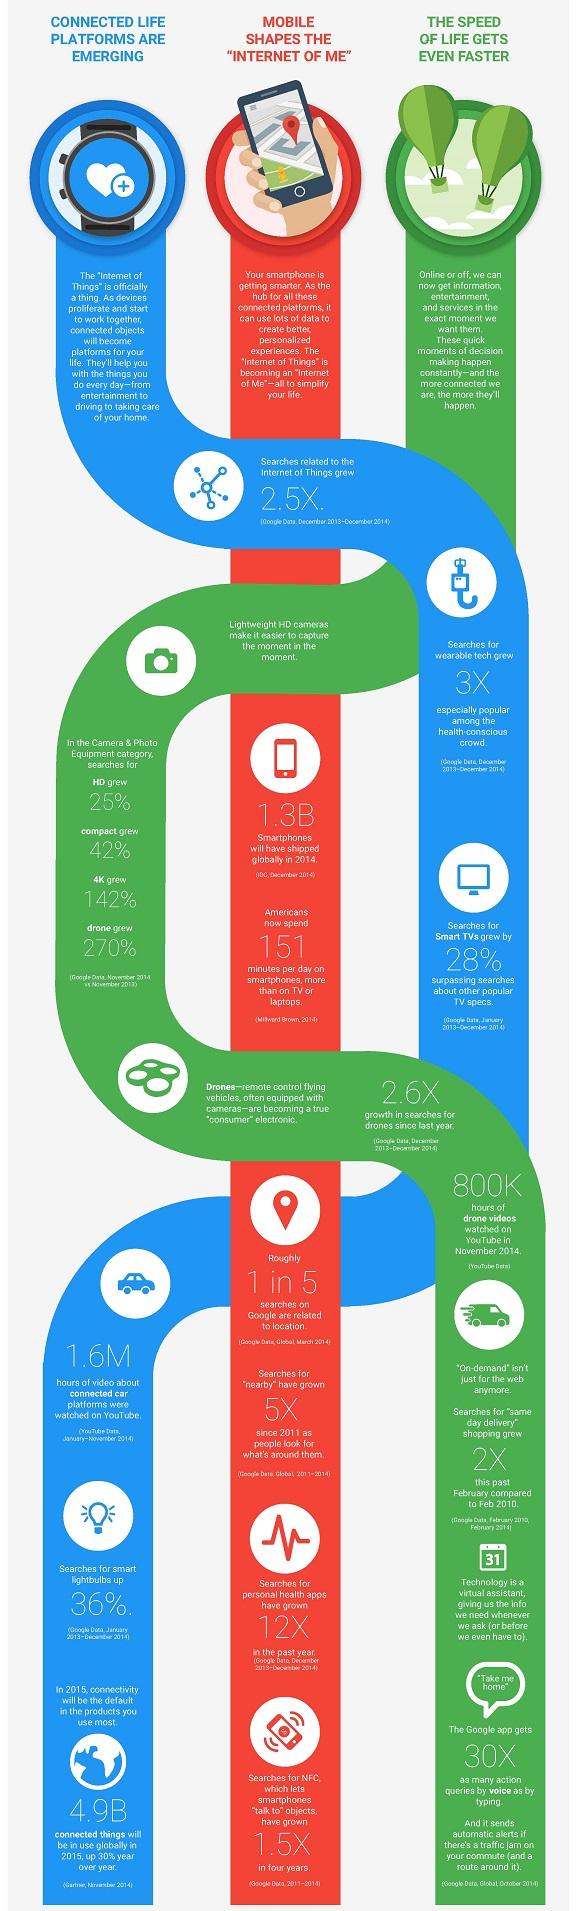 Web Marketing 2015